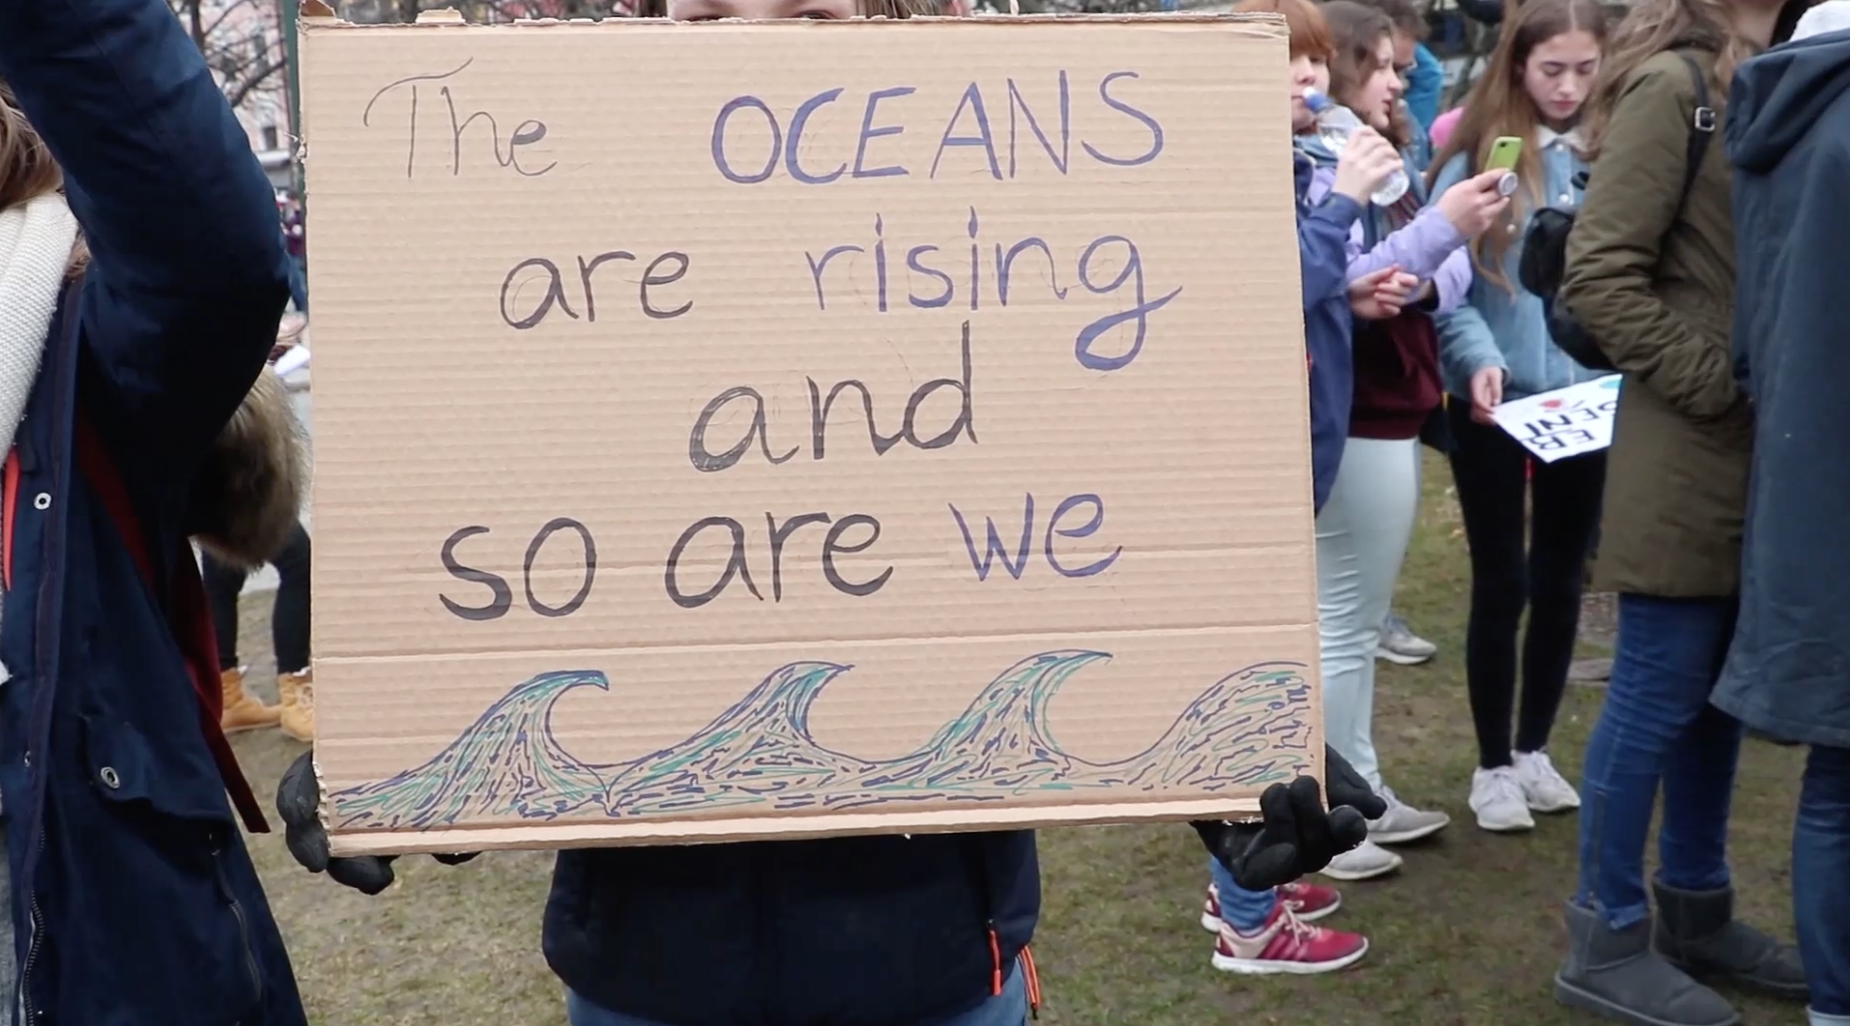 Skolestreik for klimaet - 40 000 norske skoleelever streiket for klimaet 22. mars. I Oslo og over 70 andre steder streiket elevene for at samfunnet skal innføre tiltak mot global oppvarming.